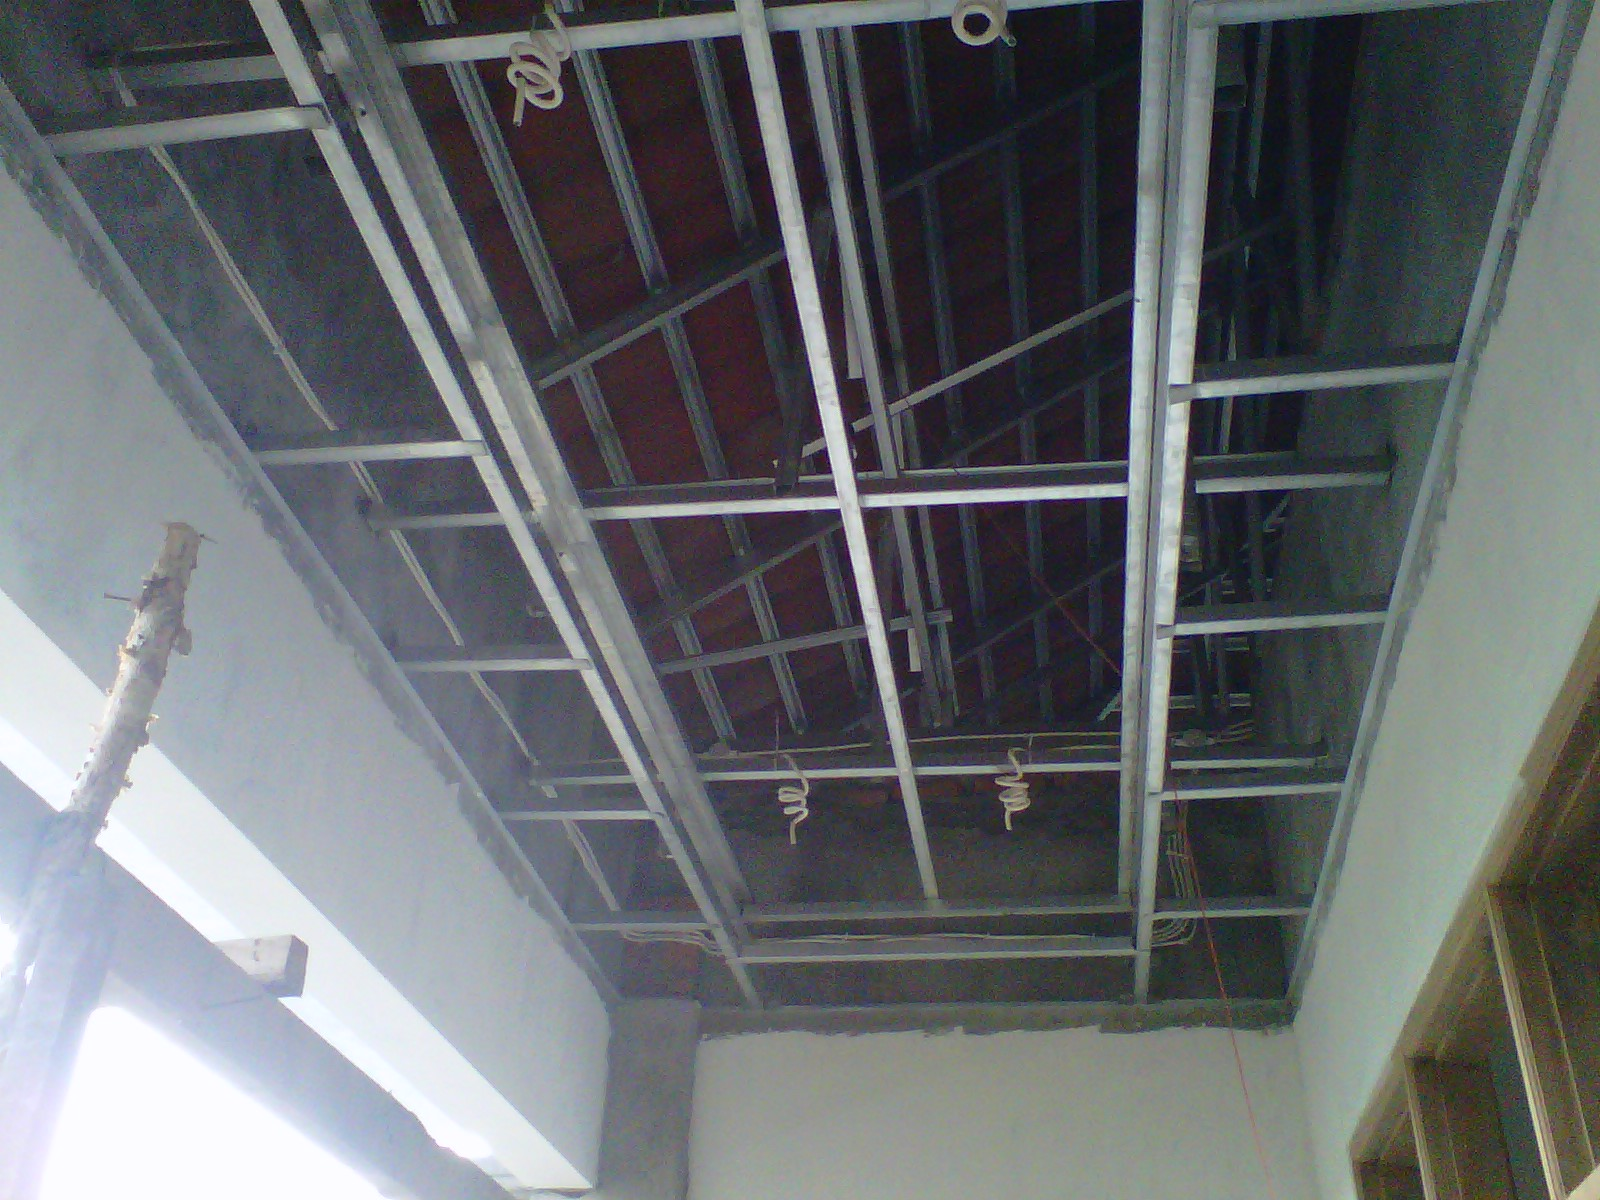 Memasang Plafon Baja Ringan Desain Rangka Gypsum Interior Minimalis